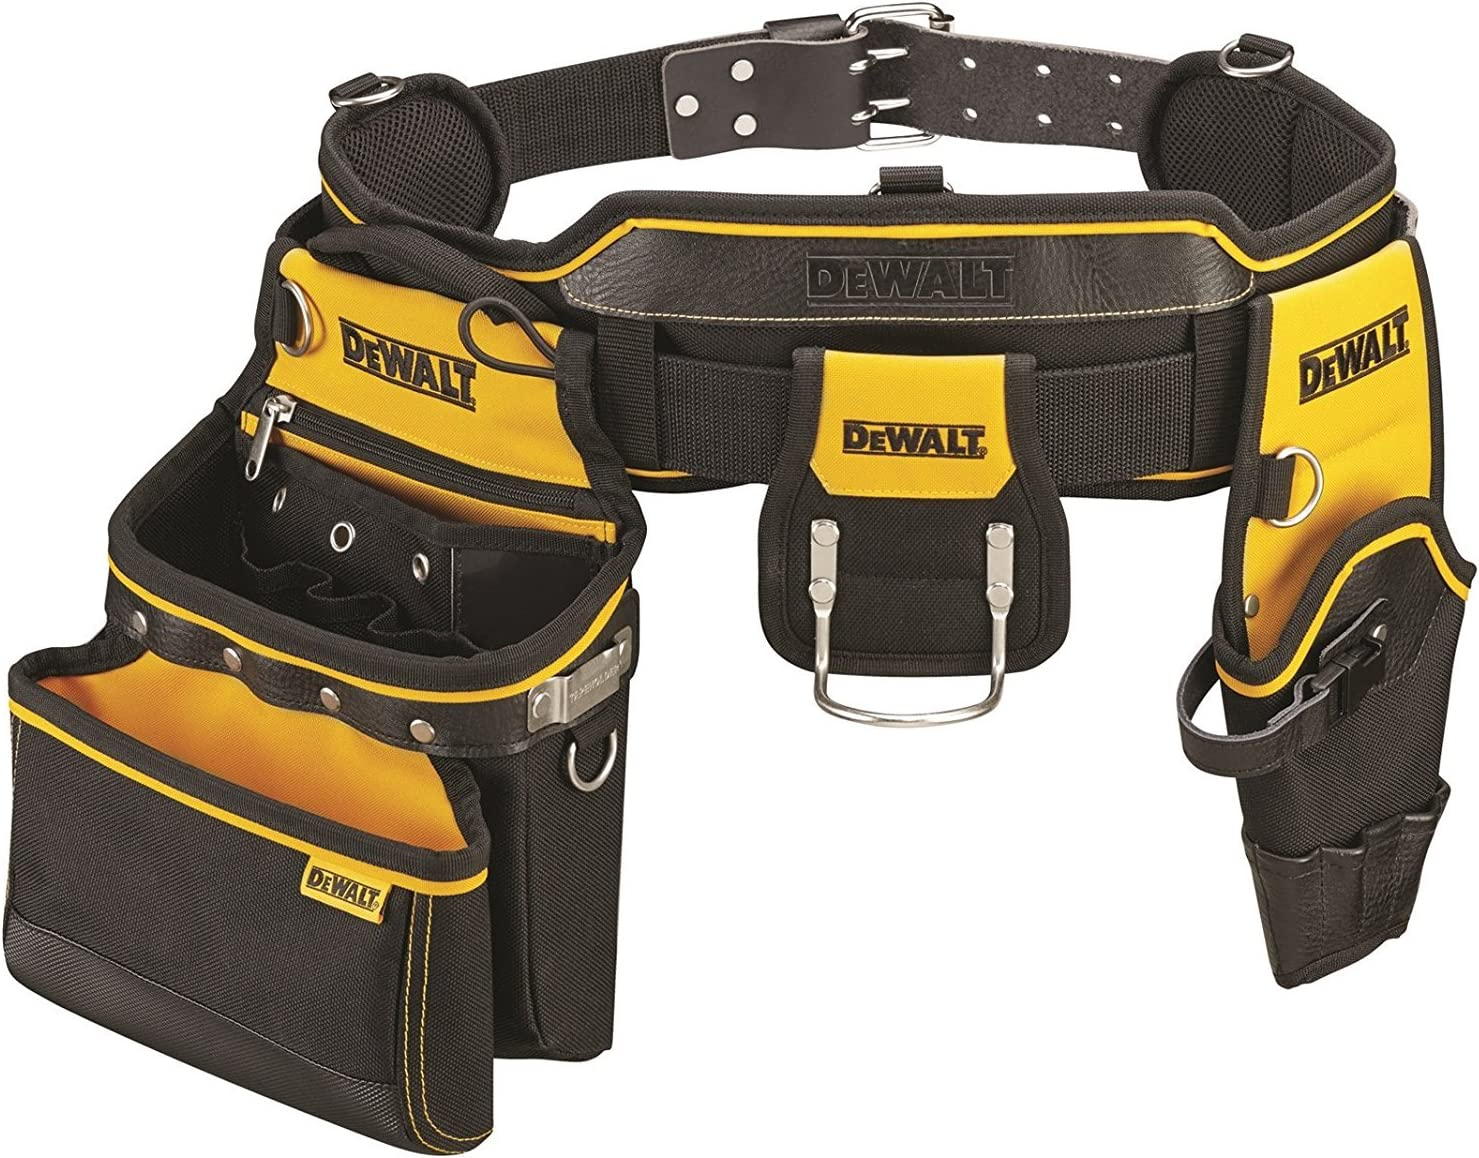 Dewalt DWST1-75552 Delantal porta-herramientas